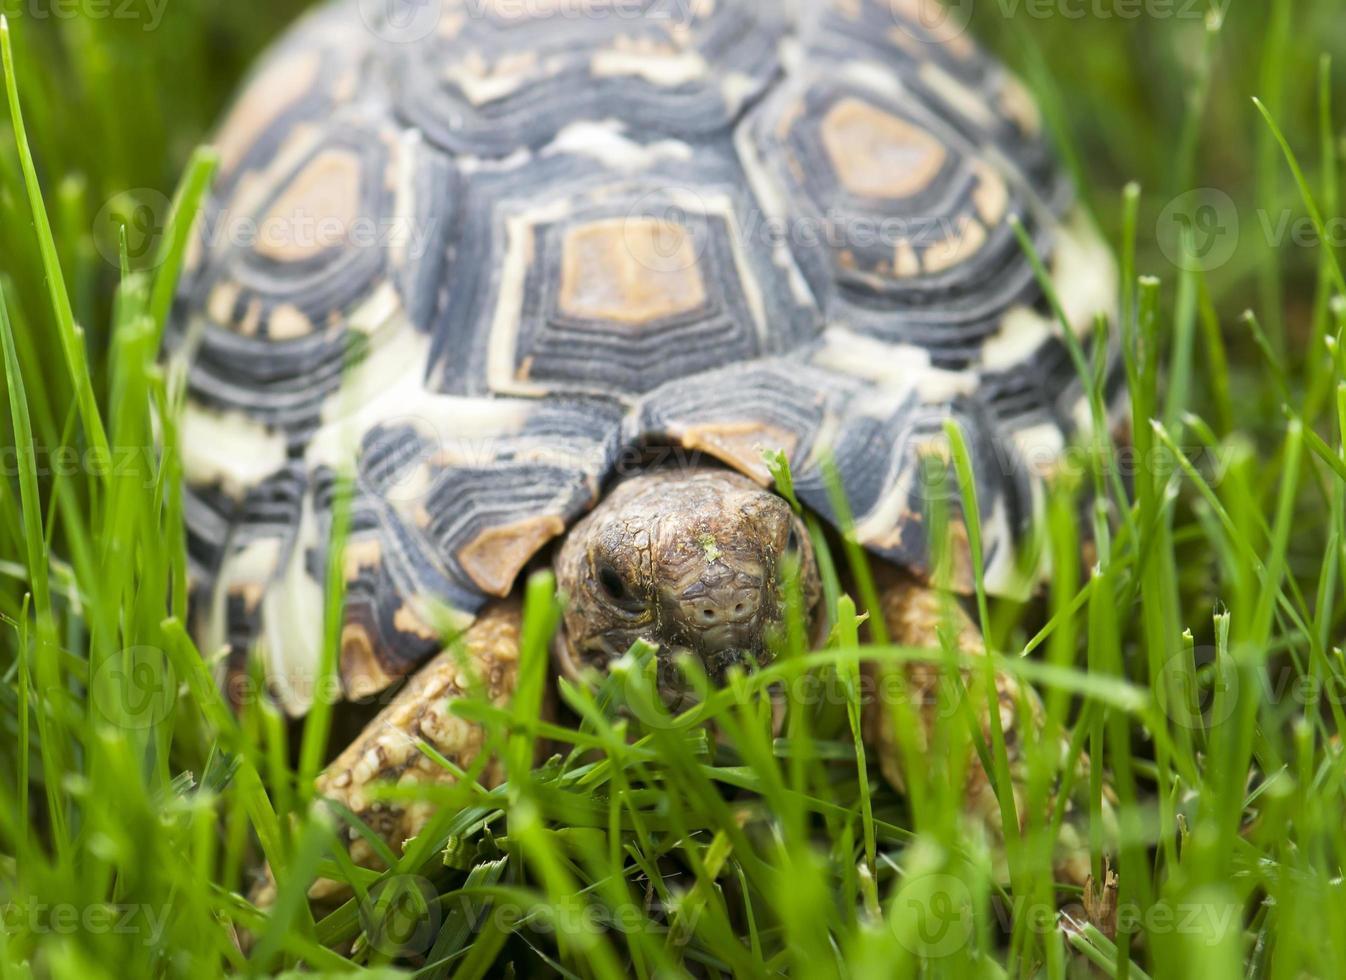 tortue marchant dans l'herbe verte photo